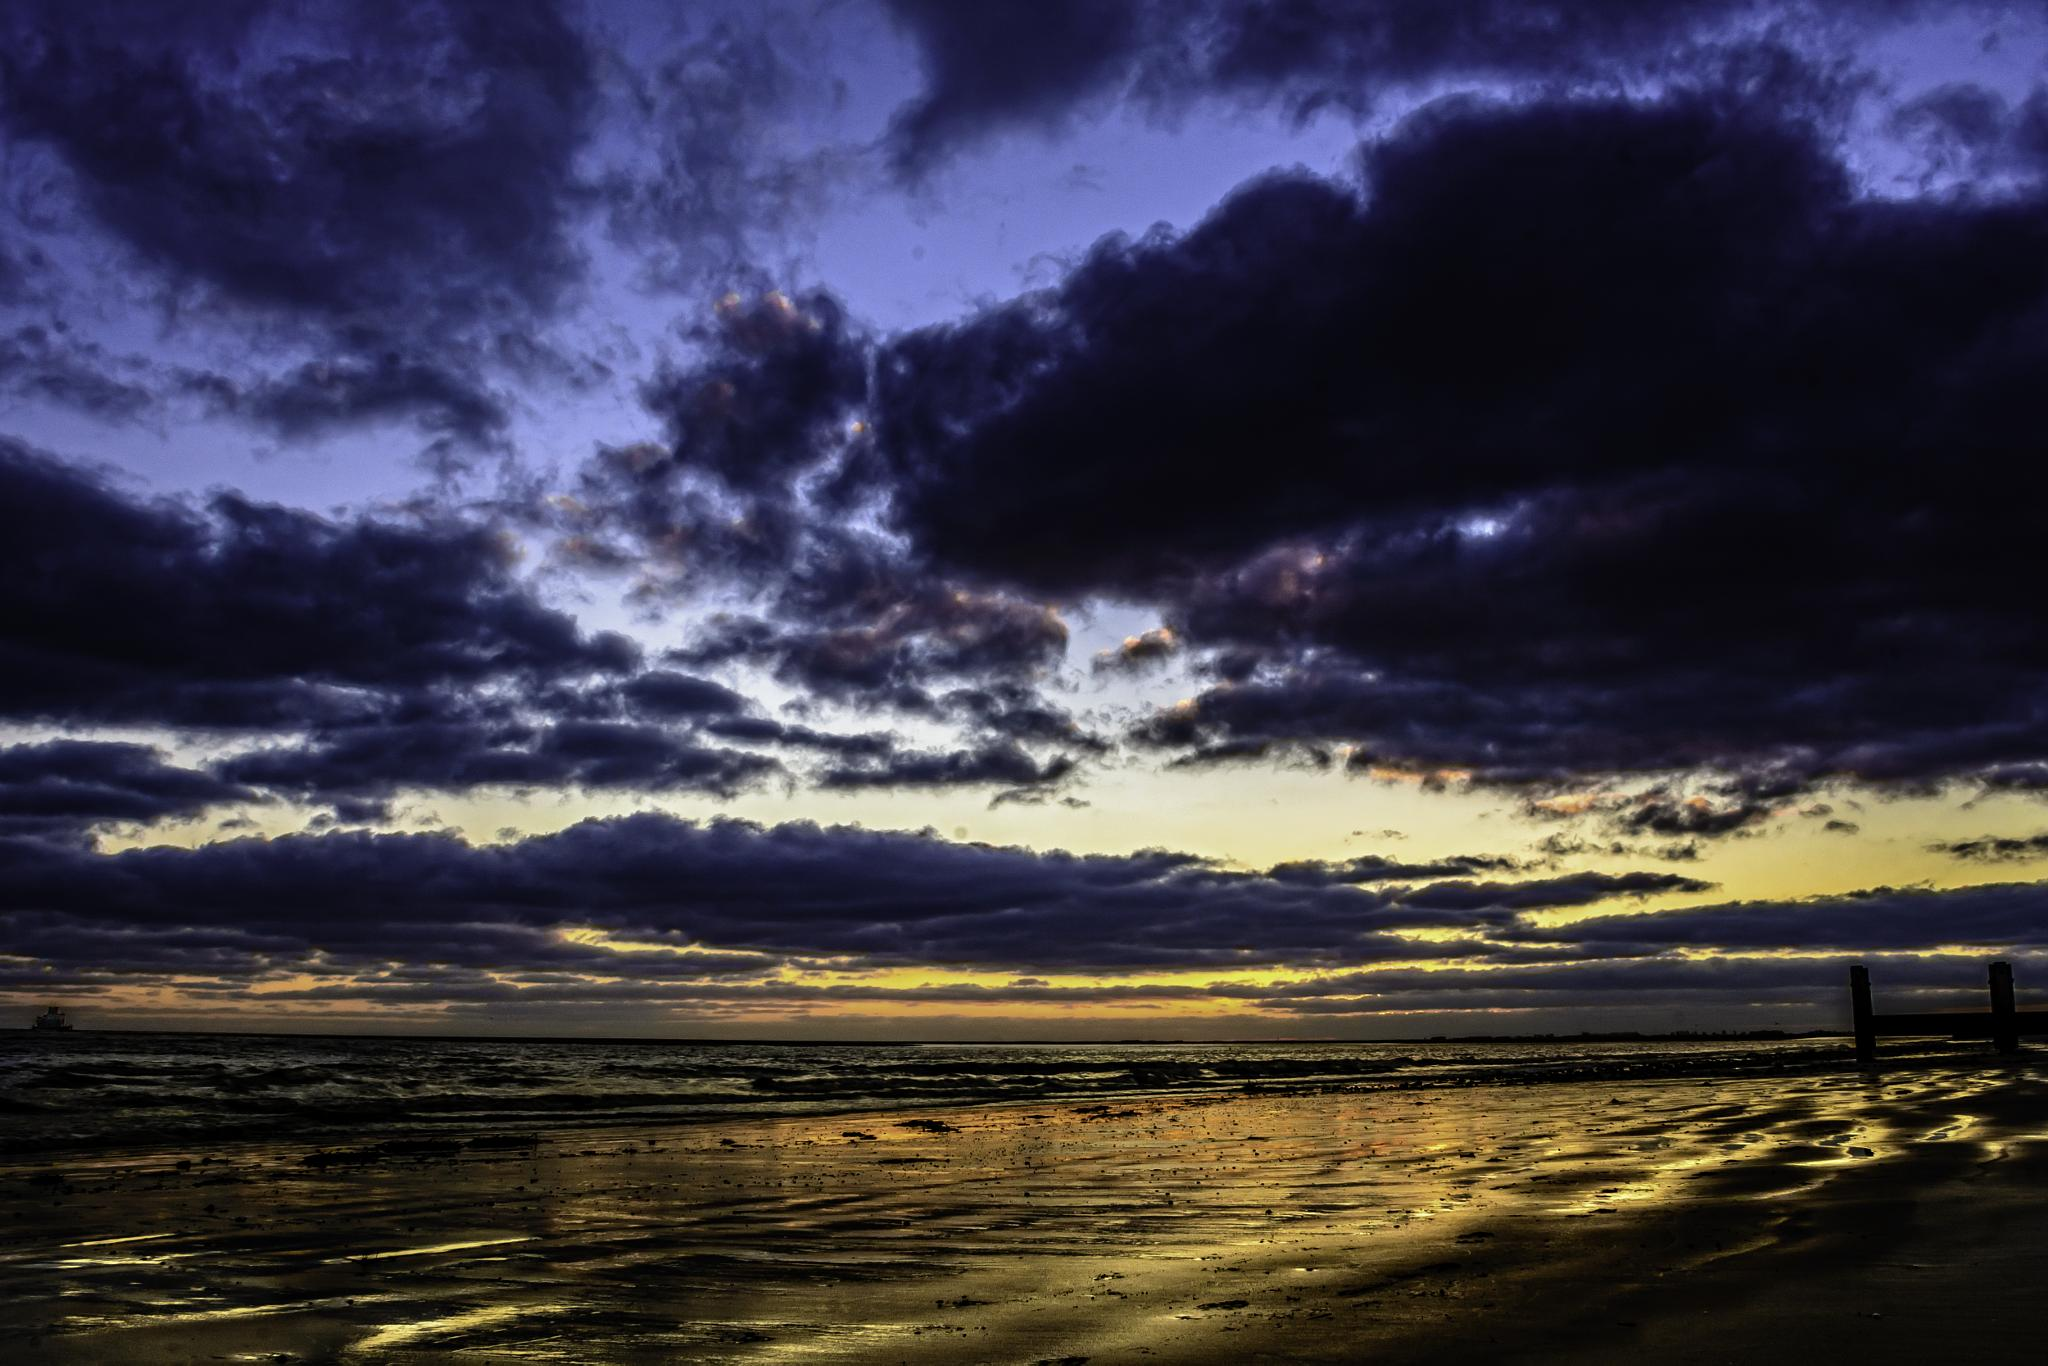 Sunrise by richard.ryan.374